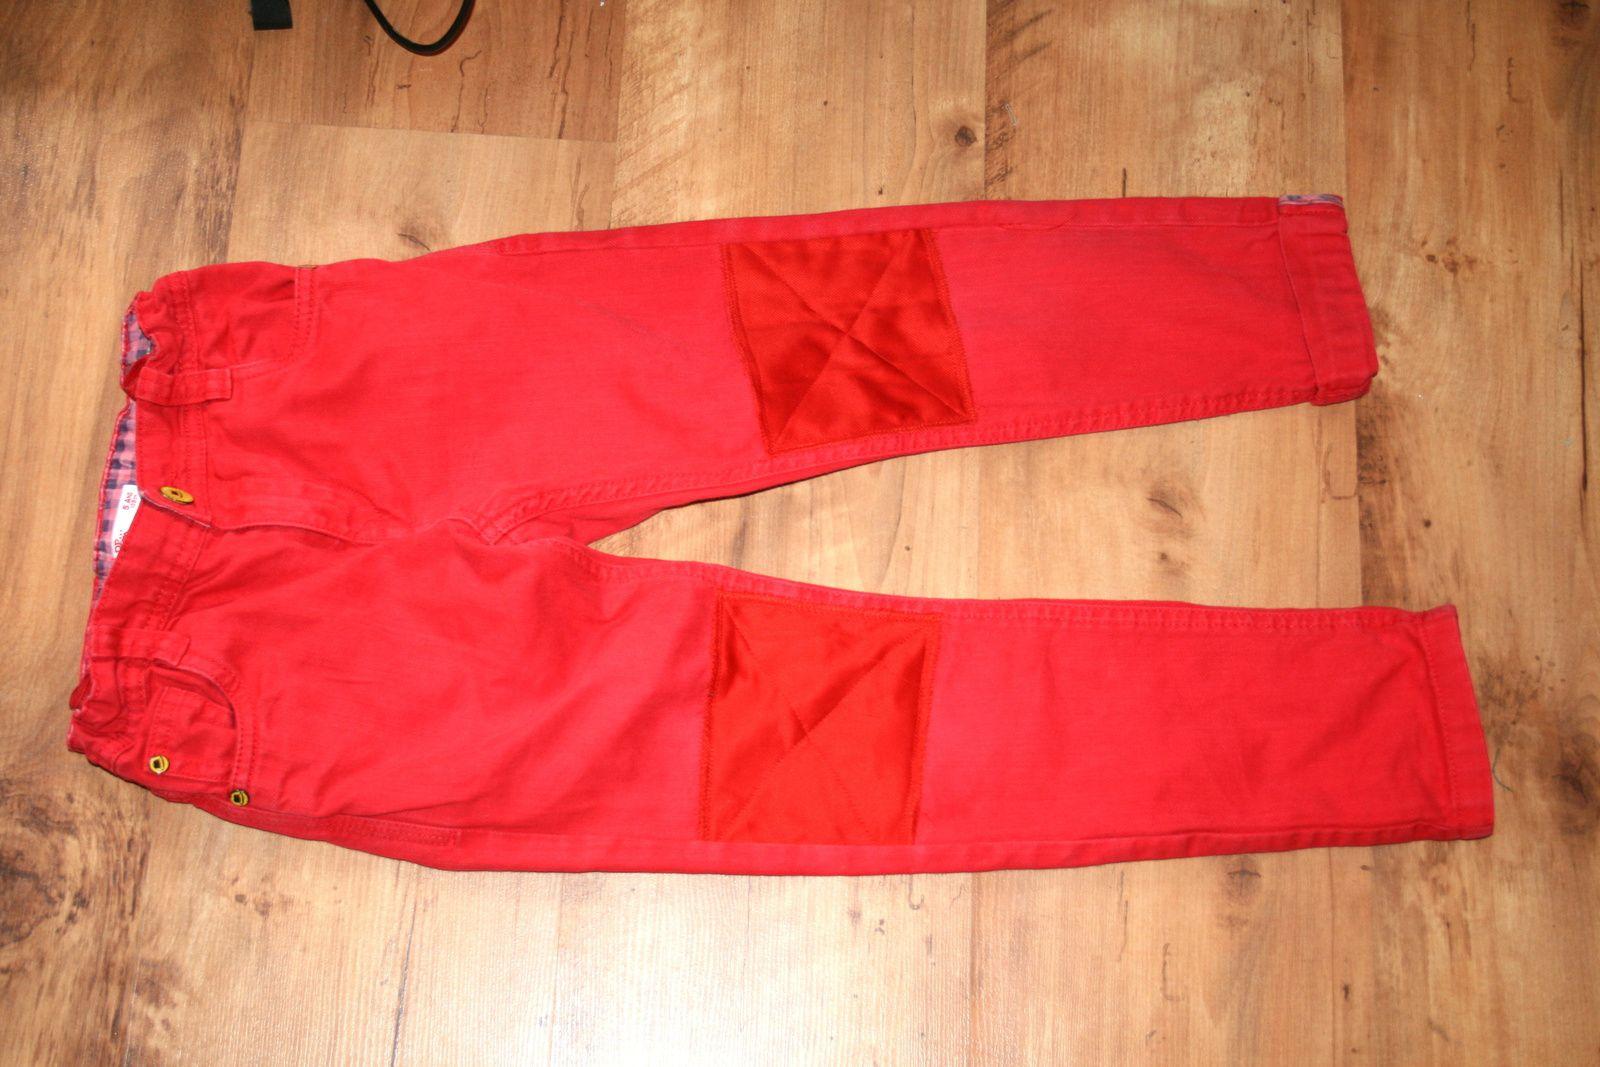 Raccommodage du pantalon enfant couture retouche